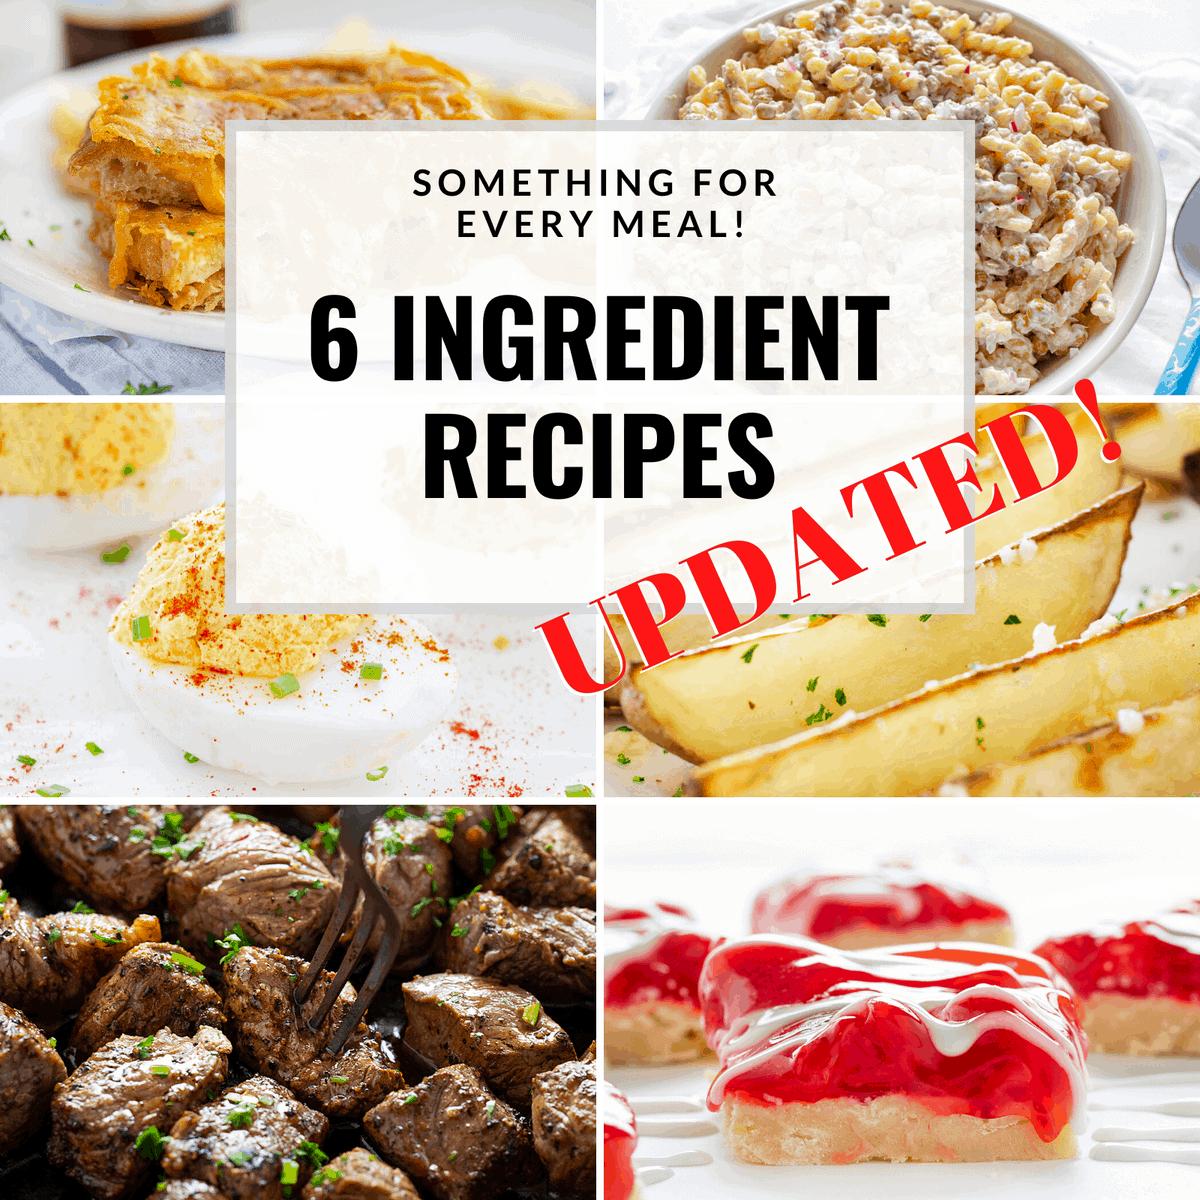 List of 6 ingredient recipes